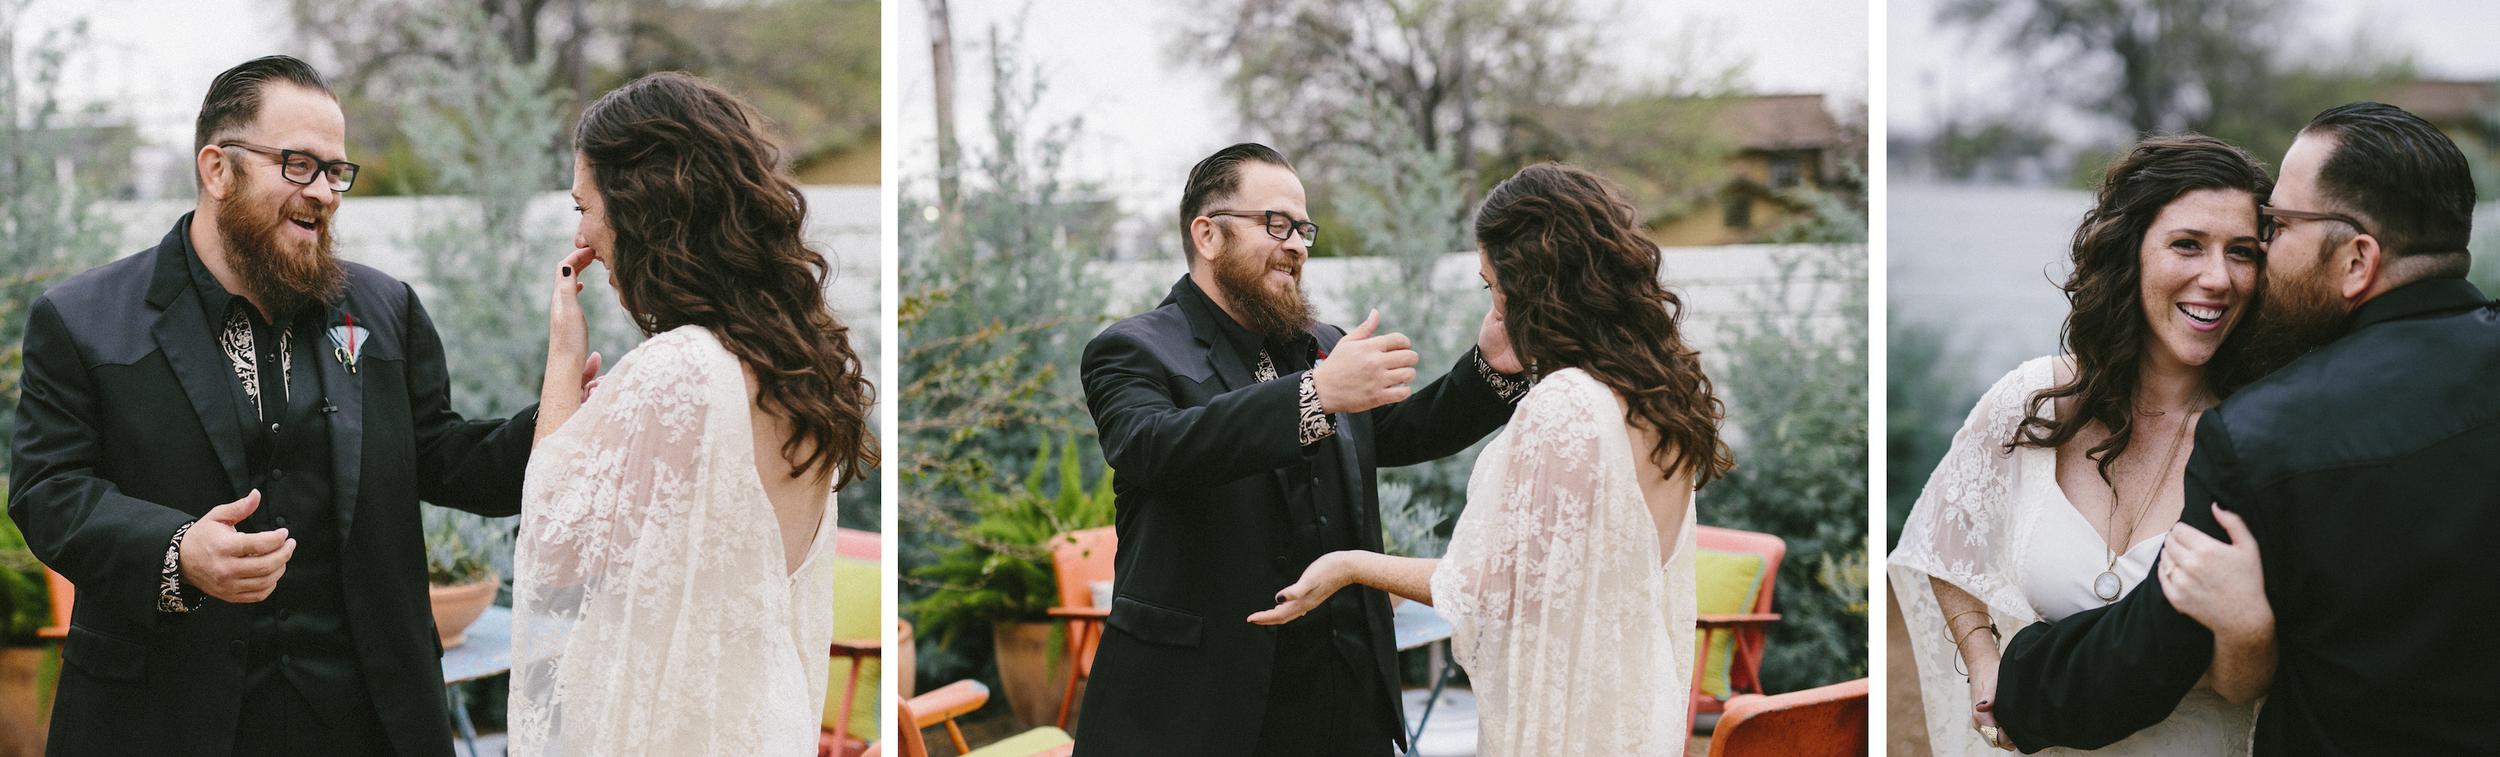 mercury-hall-wedding-austin-texas0096.JPG